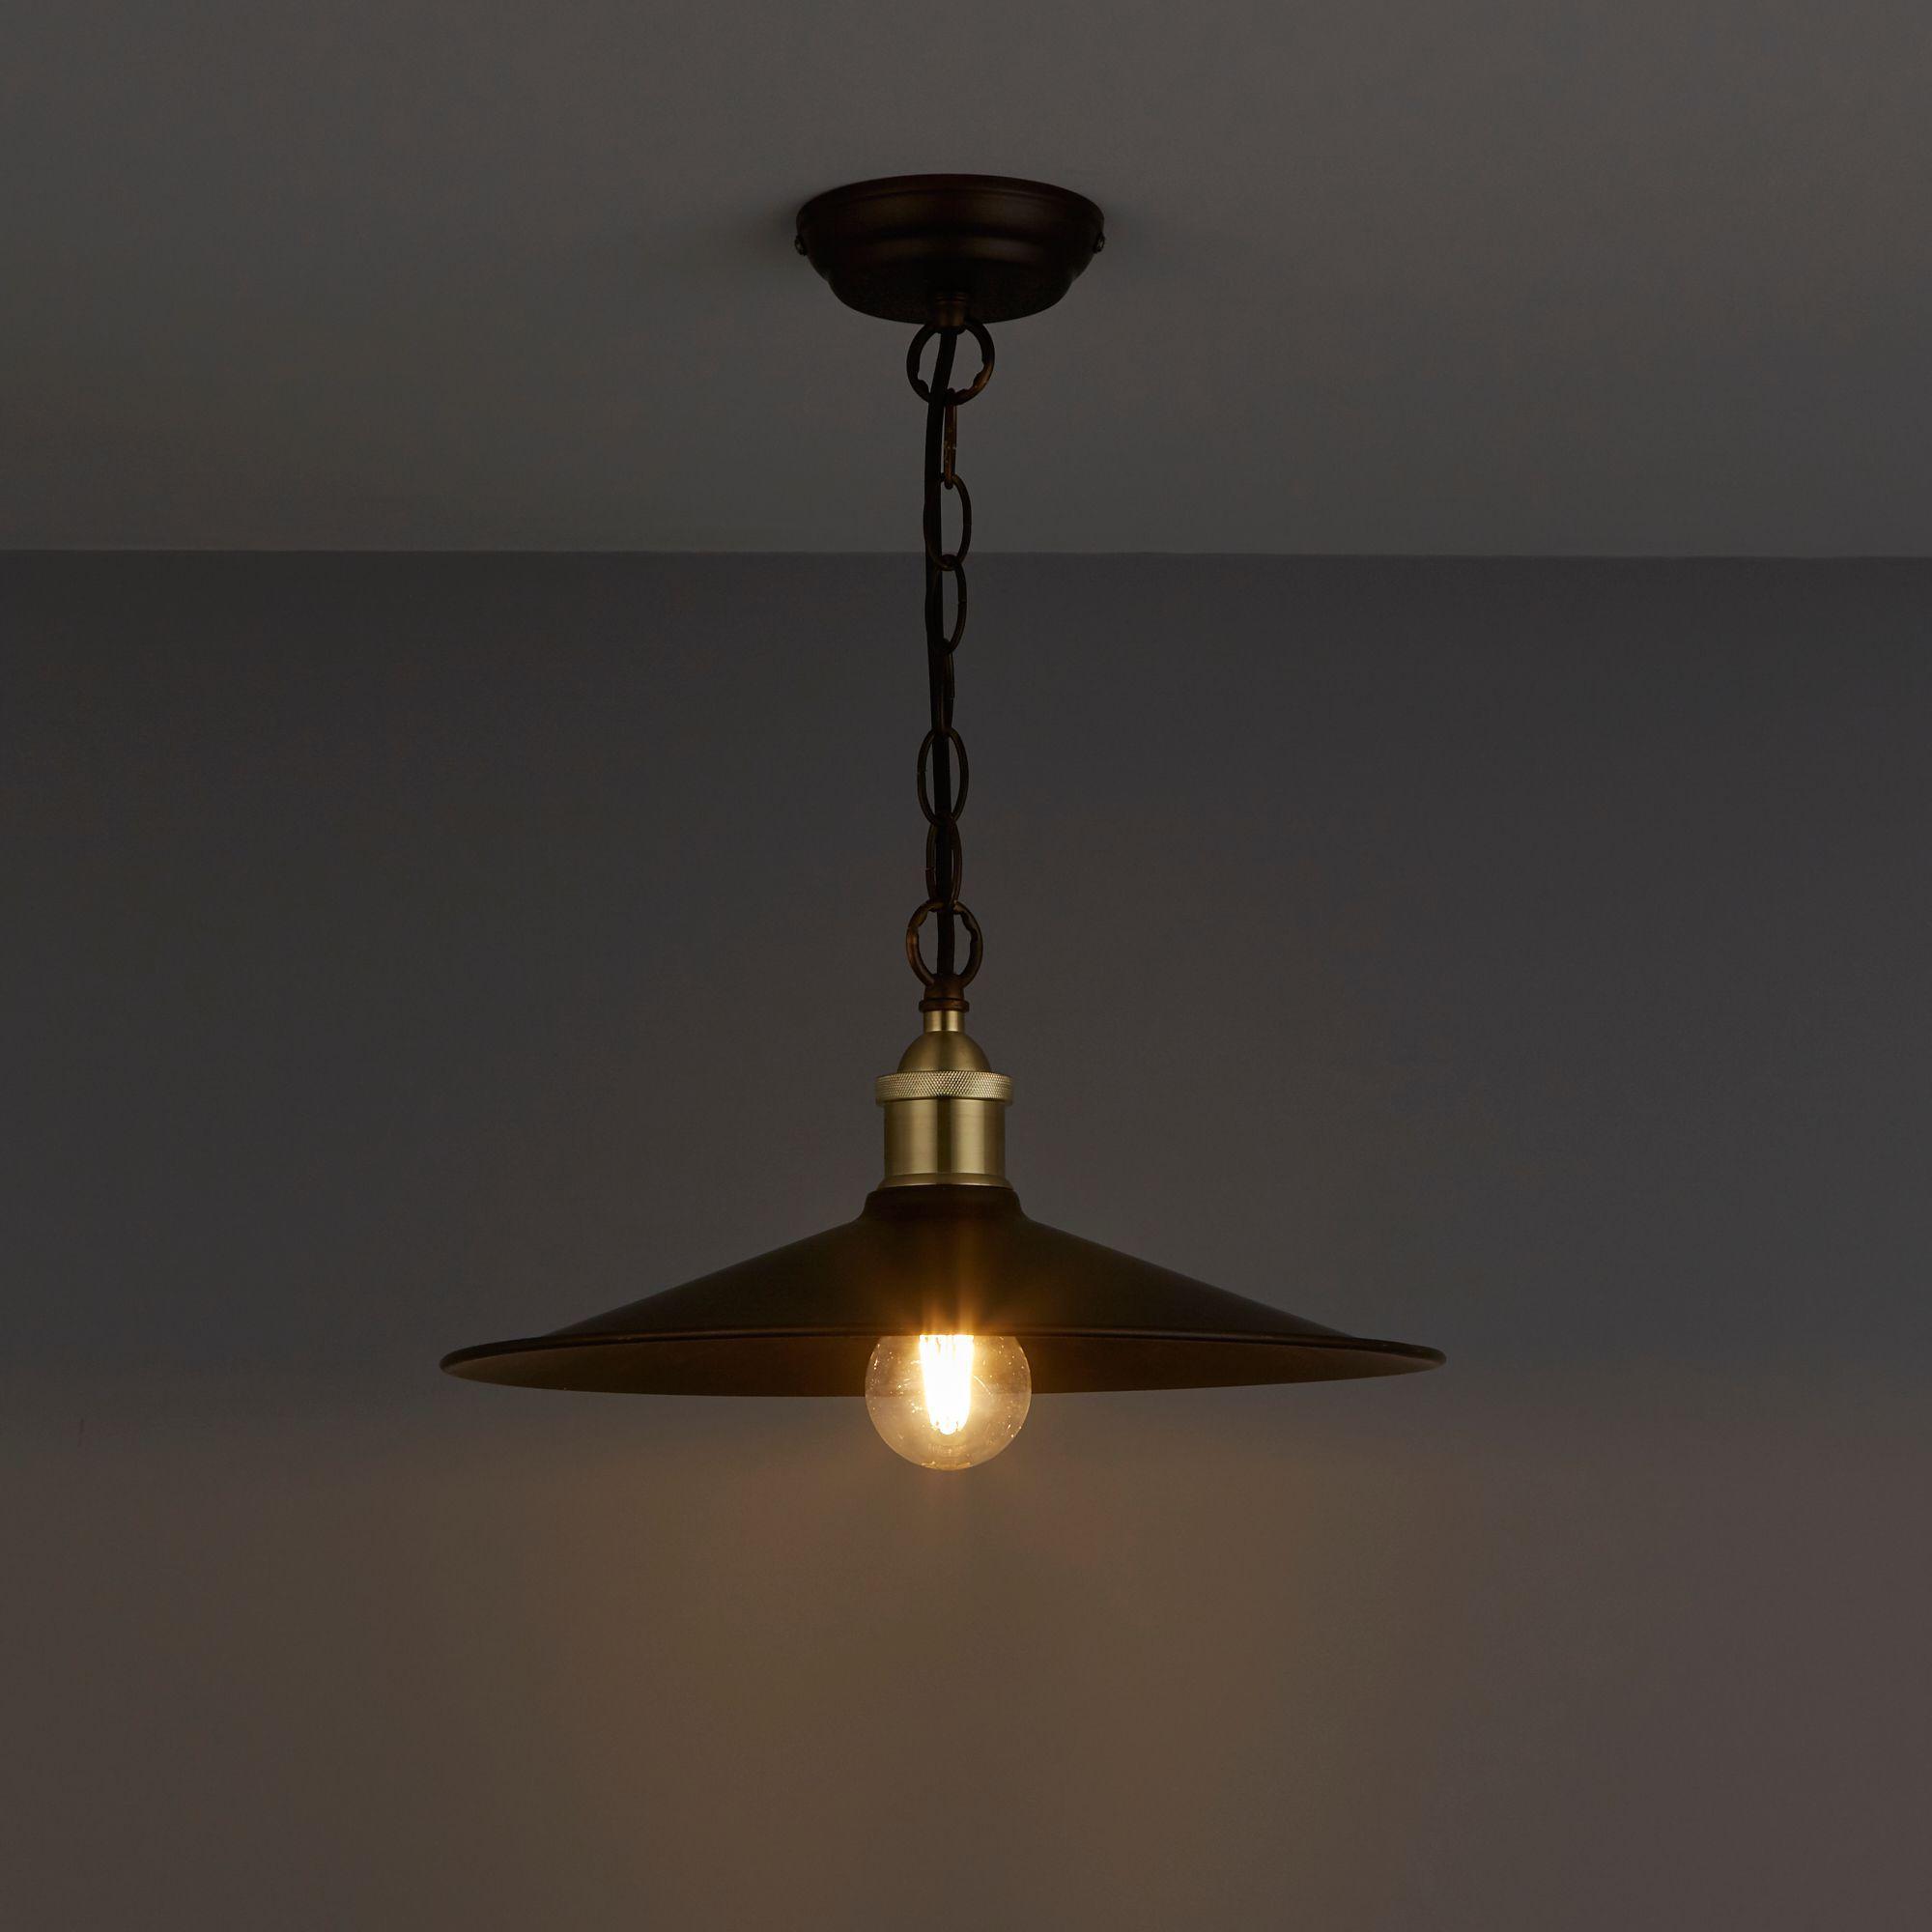 diy ceiling lighting. Alfie Bronze Effect Pendant Ceiling Light Diy Lighting K